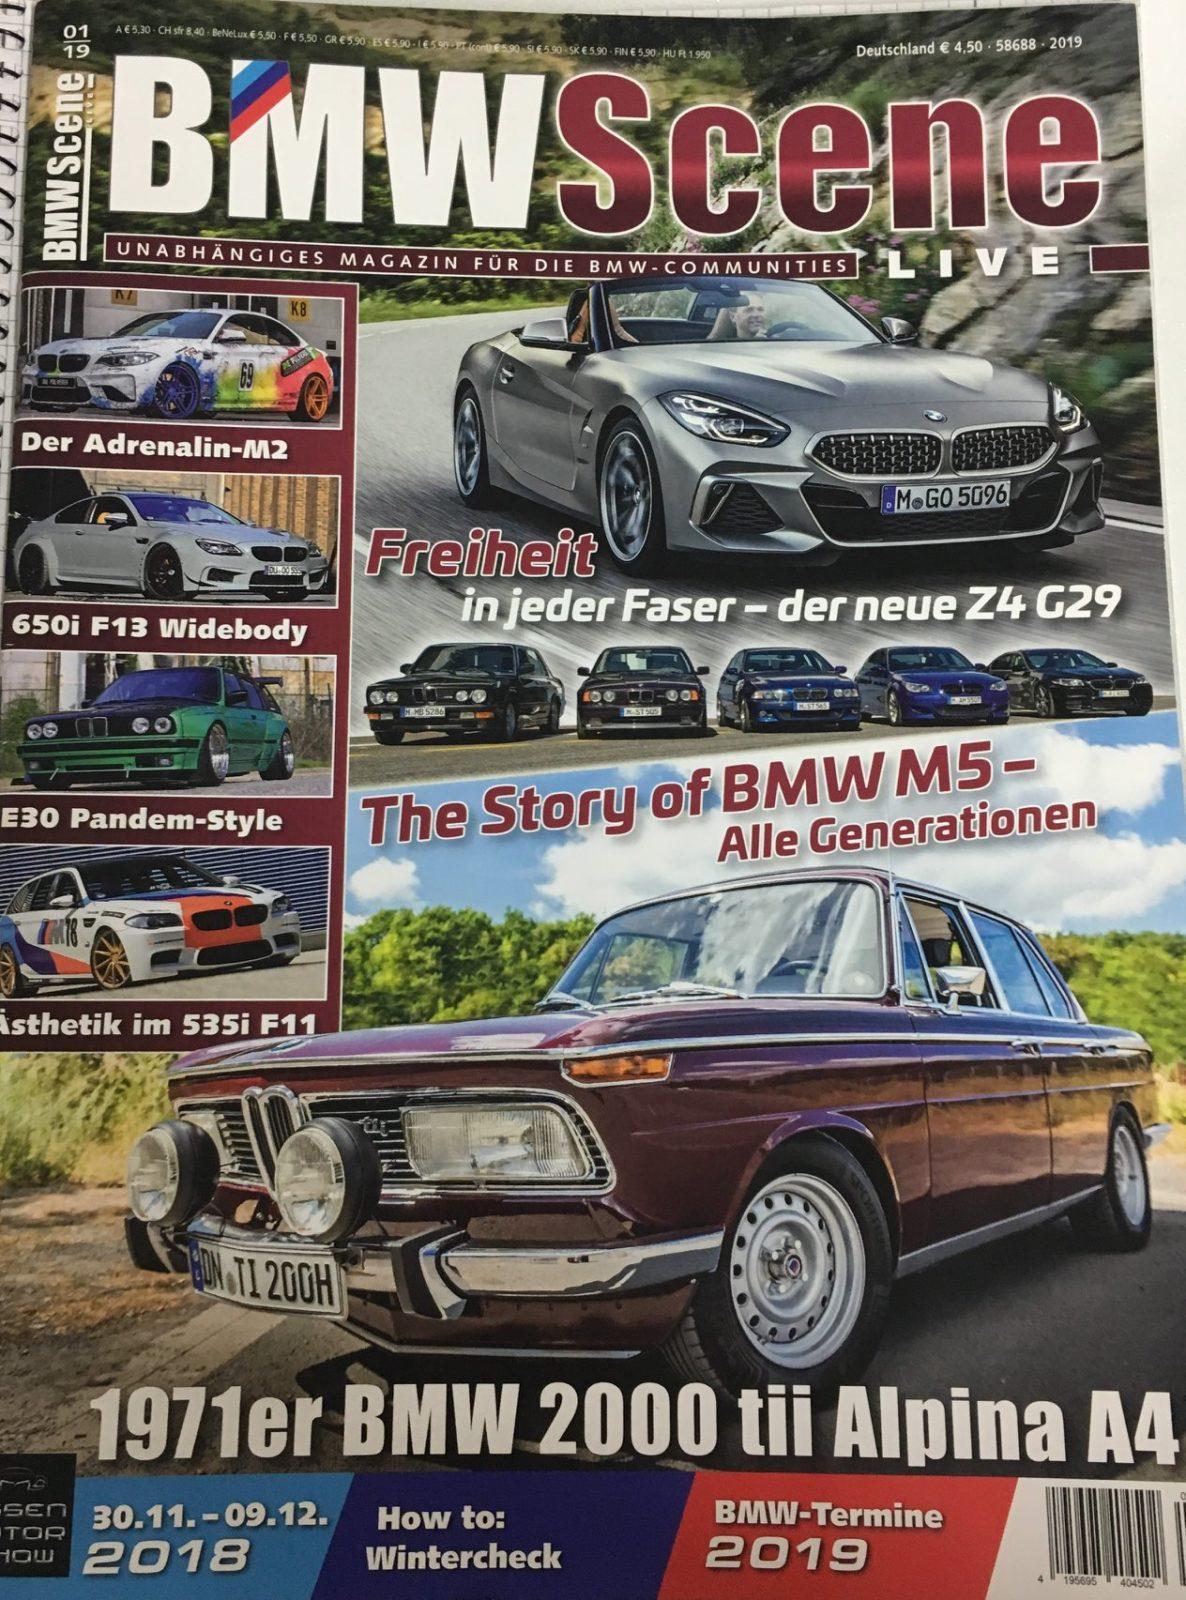 BMW Scene Magazin mit dem BMW M2